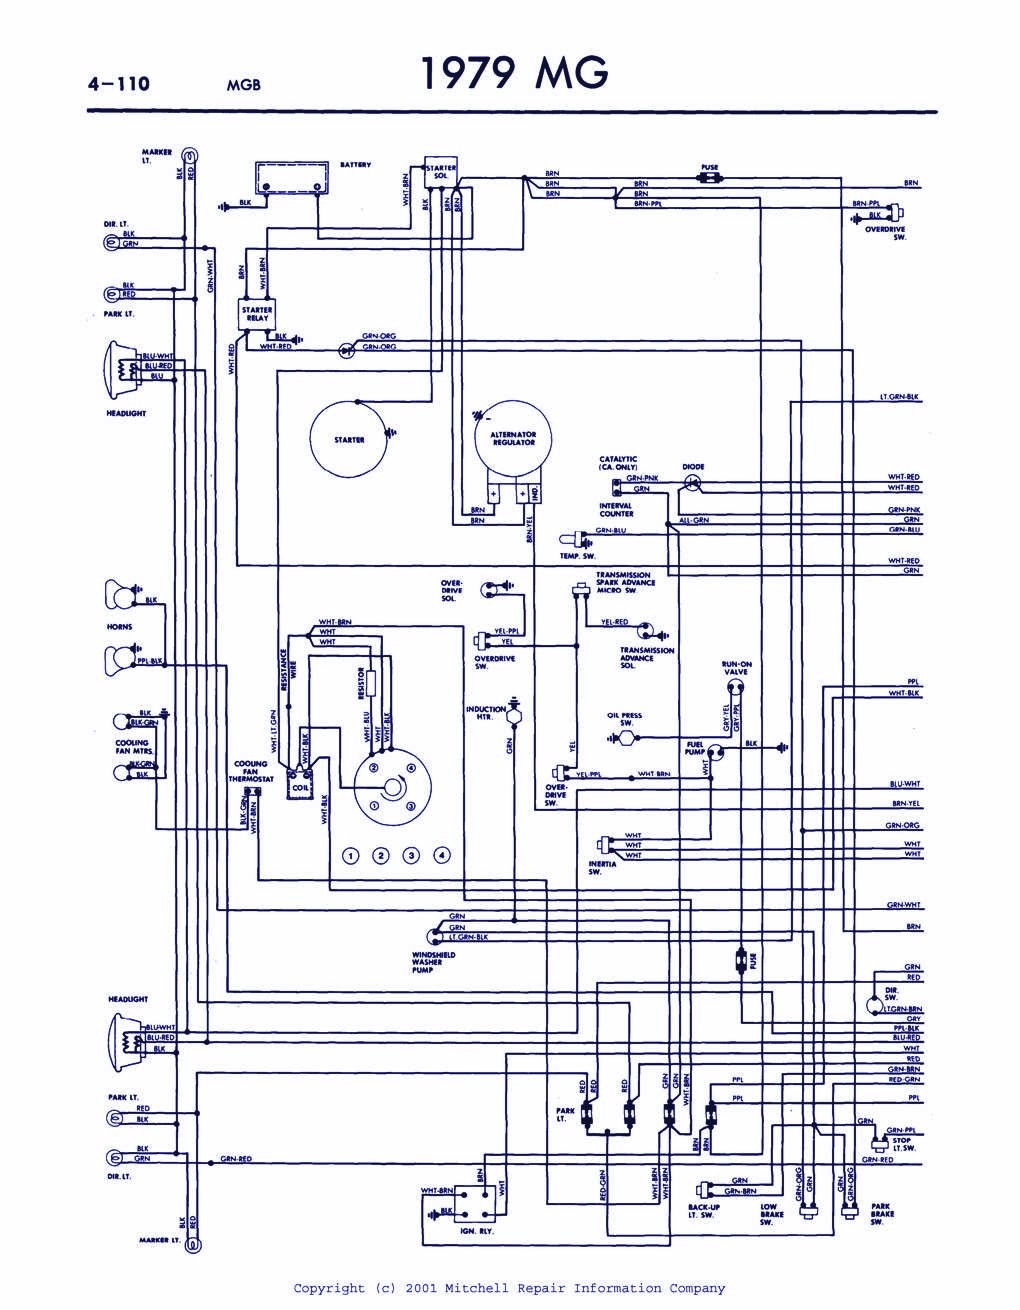 1972 mgb wiring harness wiring diagram paper1972 mgb wiring diagram wiring diagram yes 1972 mgb wiring